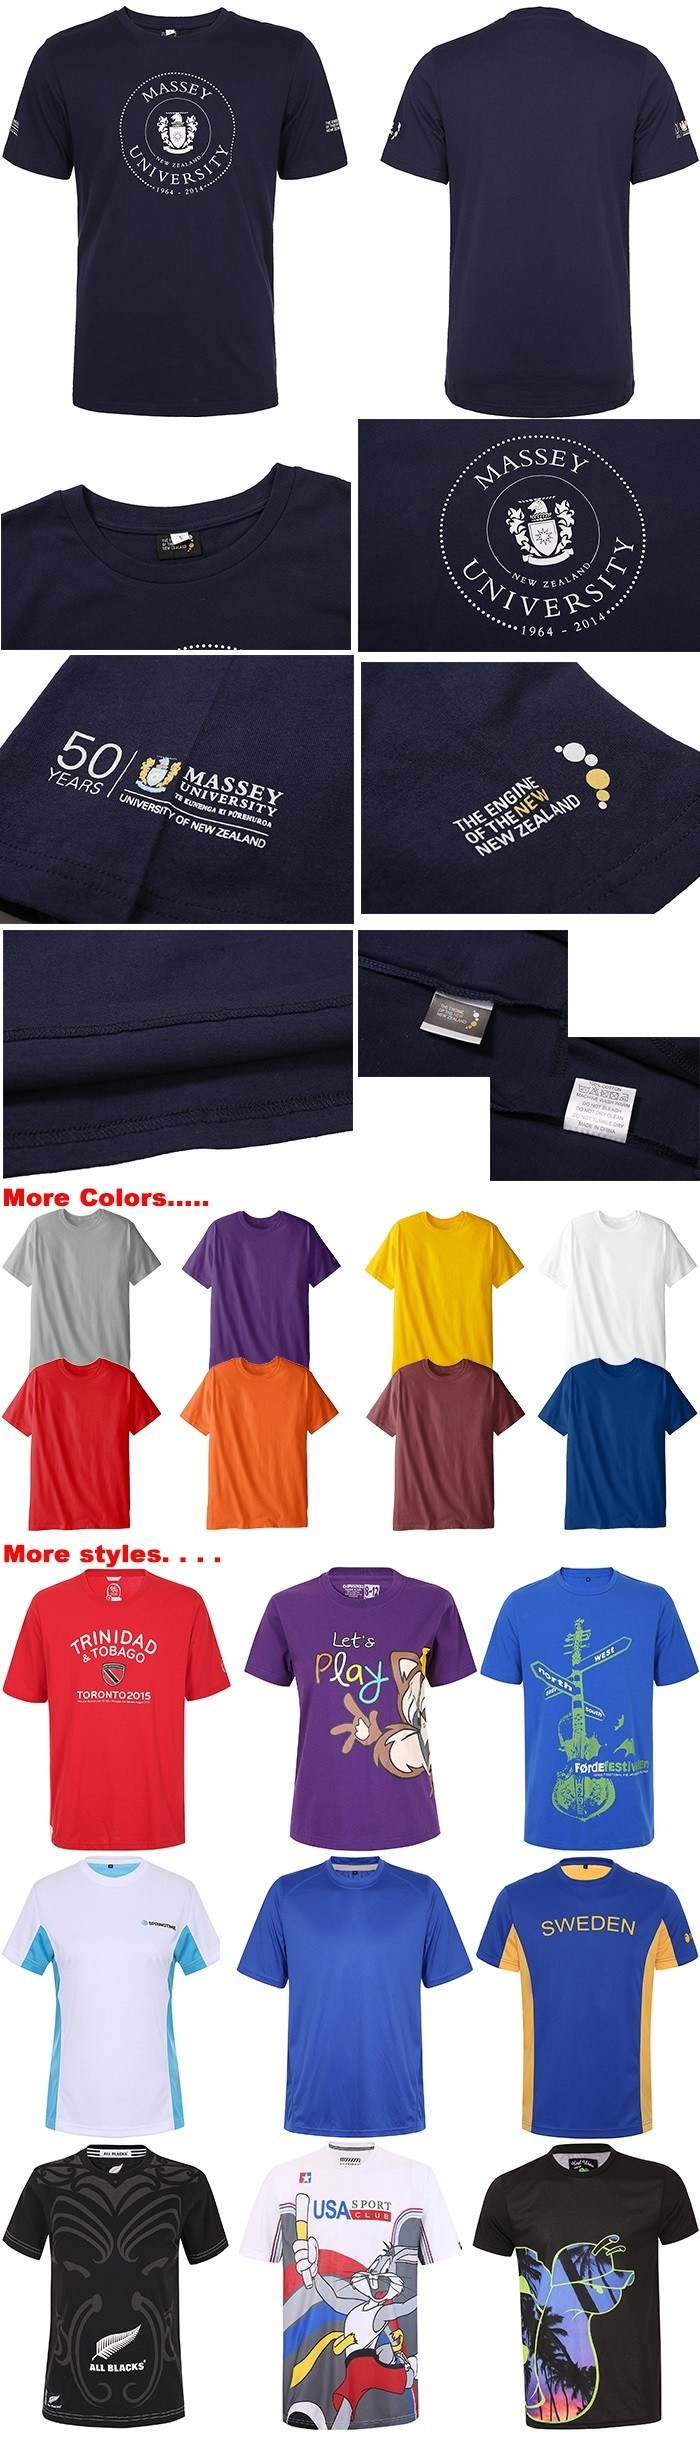 overseas logo custom t shirt printing